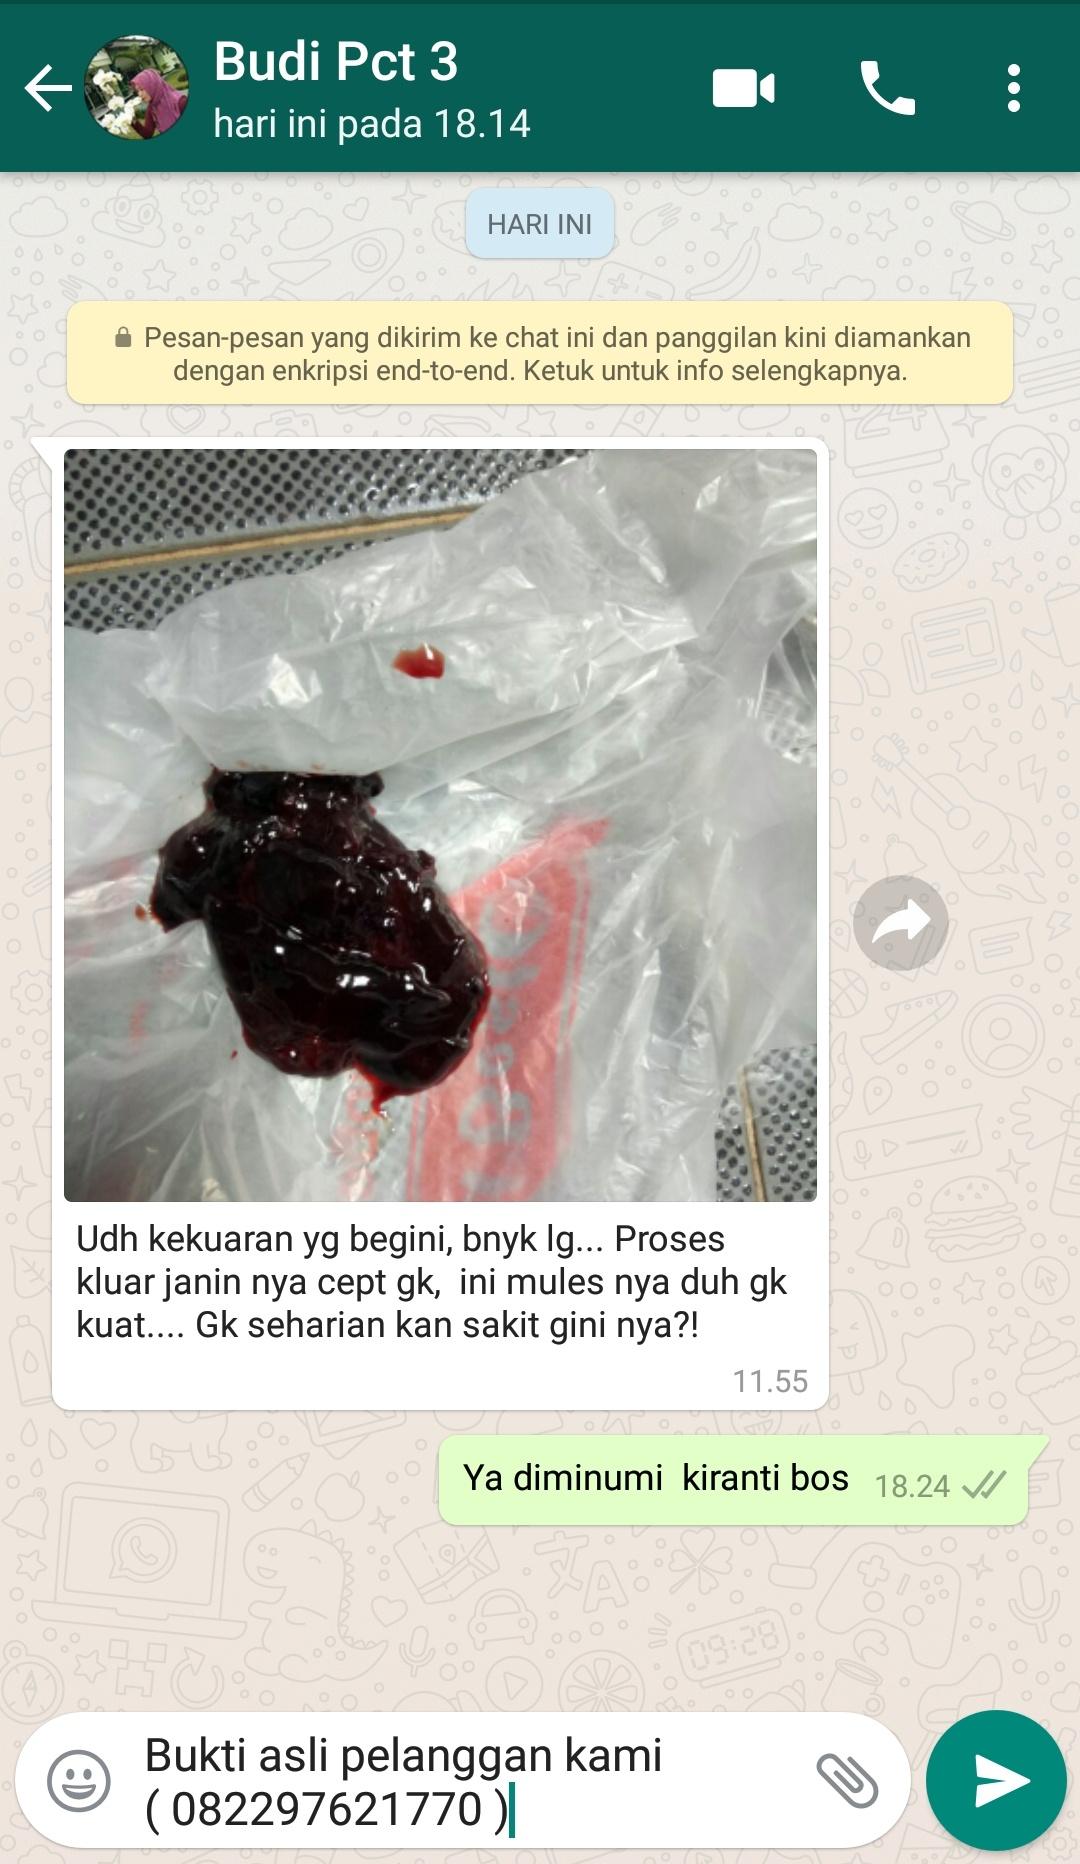 Obat Aborsi Banyuwangi Jawa Timur